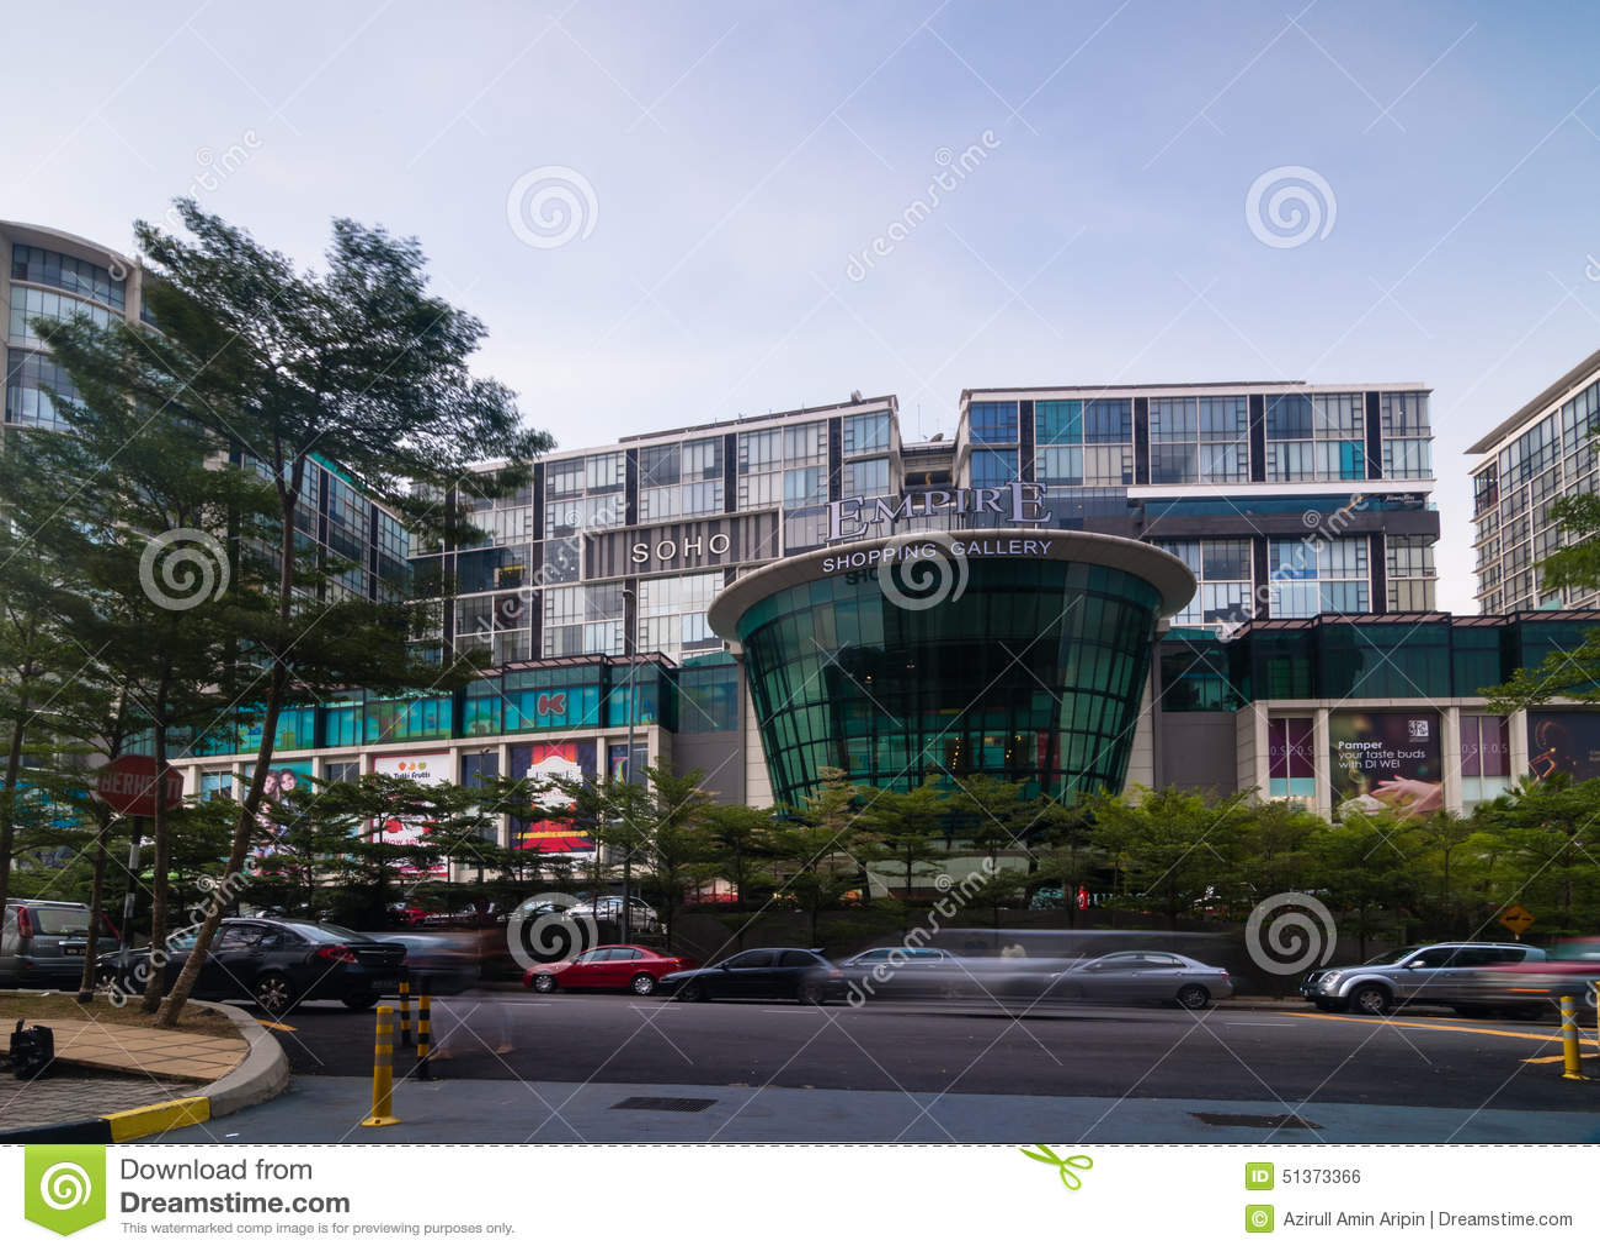 SELANGOR - 18. MAI: Dieses ist neue Einkaufszentrumanruf Reich-Einkaufsgalerie am 18. Mai 2012 in subang jaya, Selangor, Malaysia